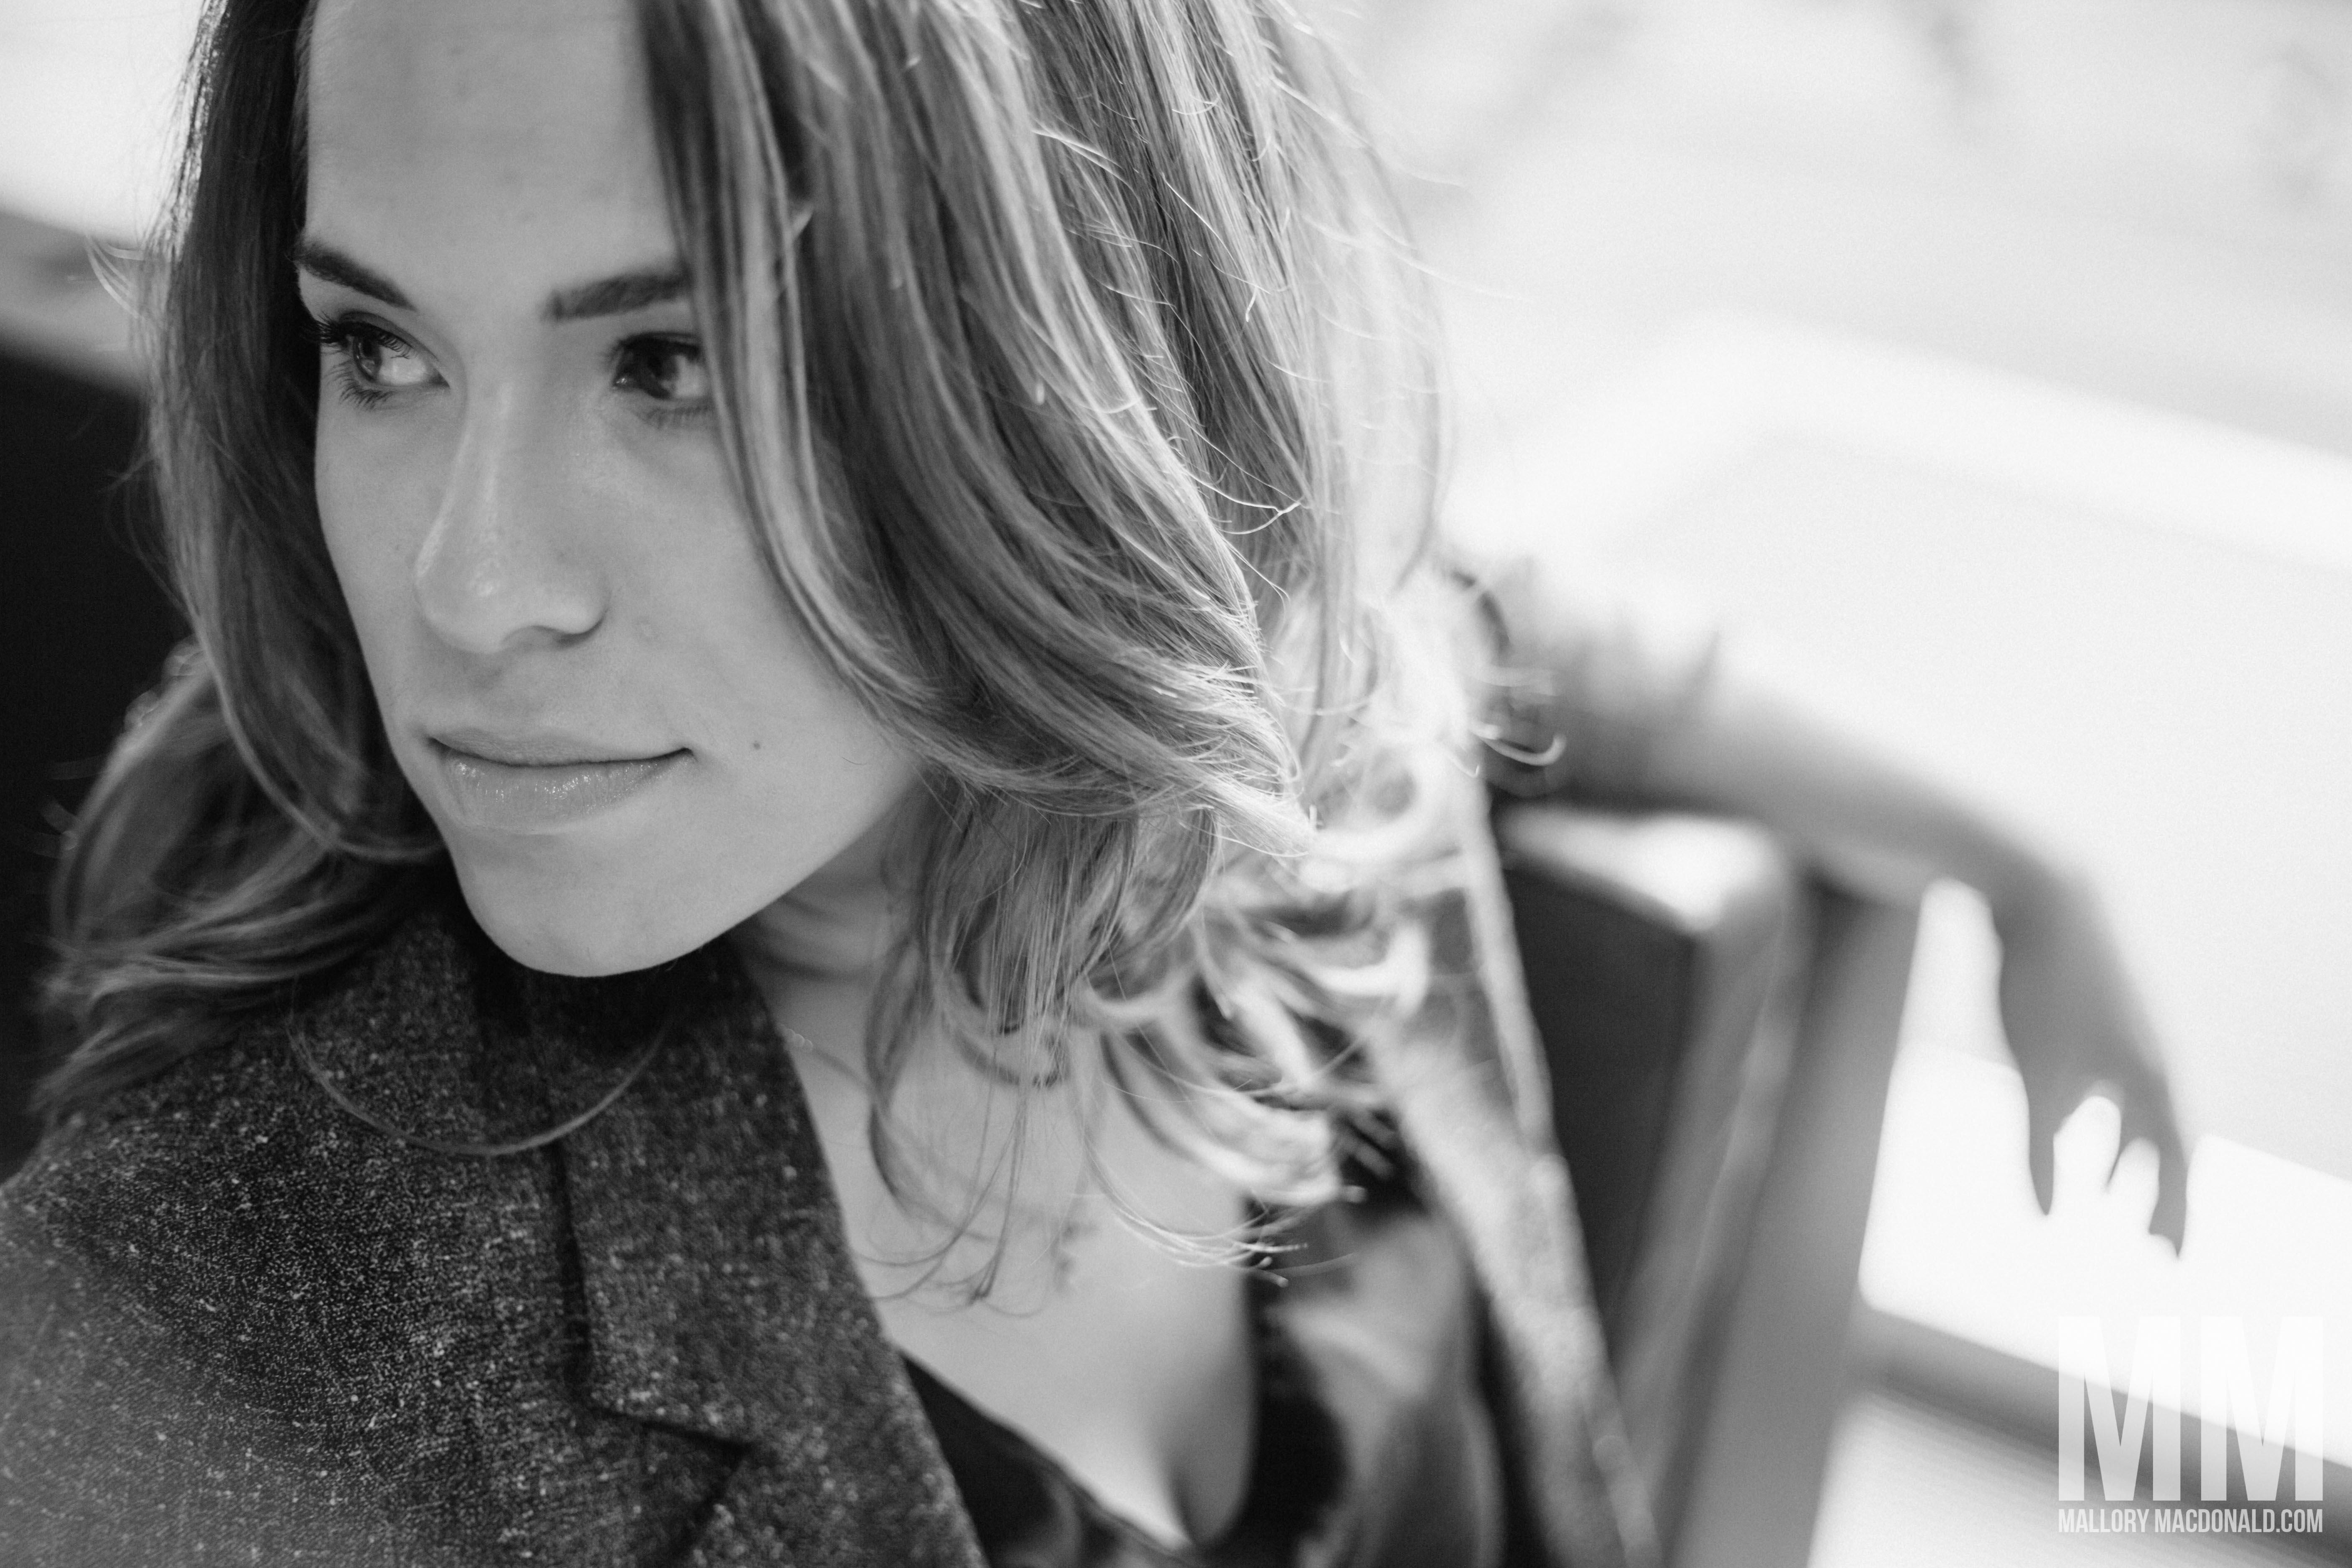 Becky-seattle-rb spa studio-storyville coffee-photo shoot-mallory macdonald-8079